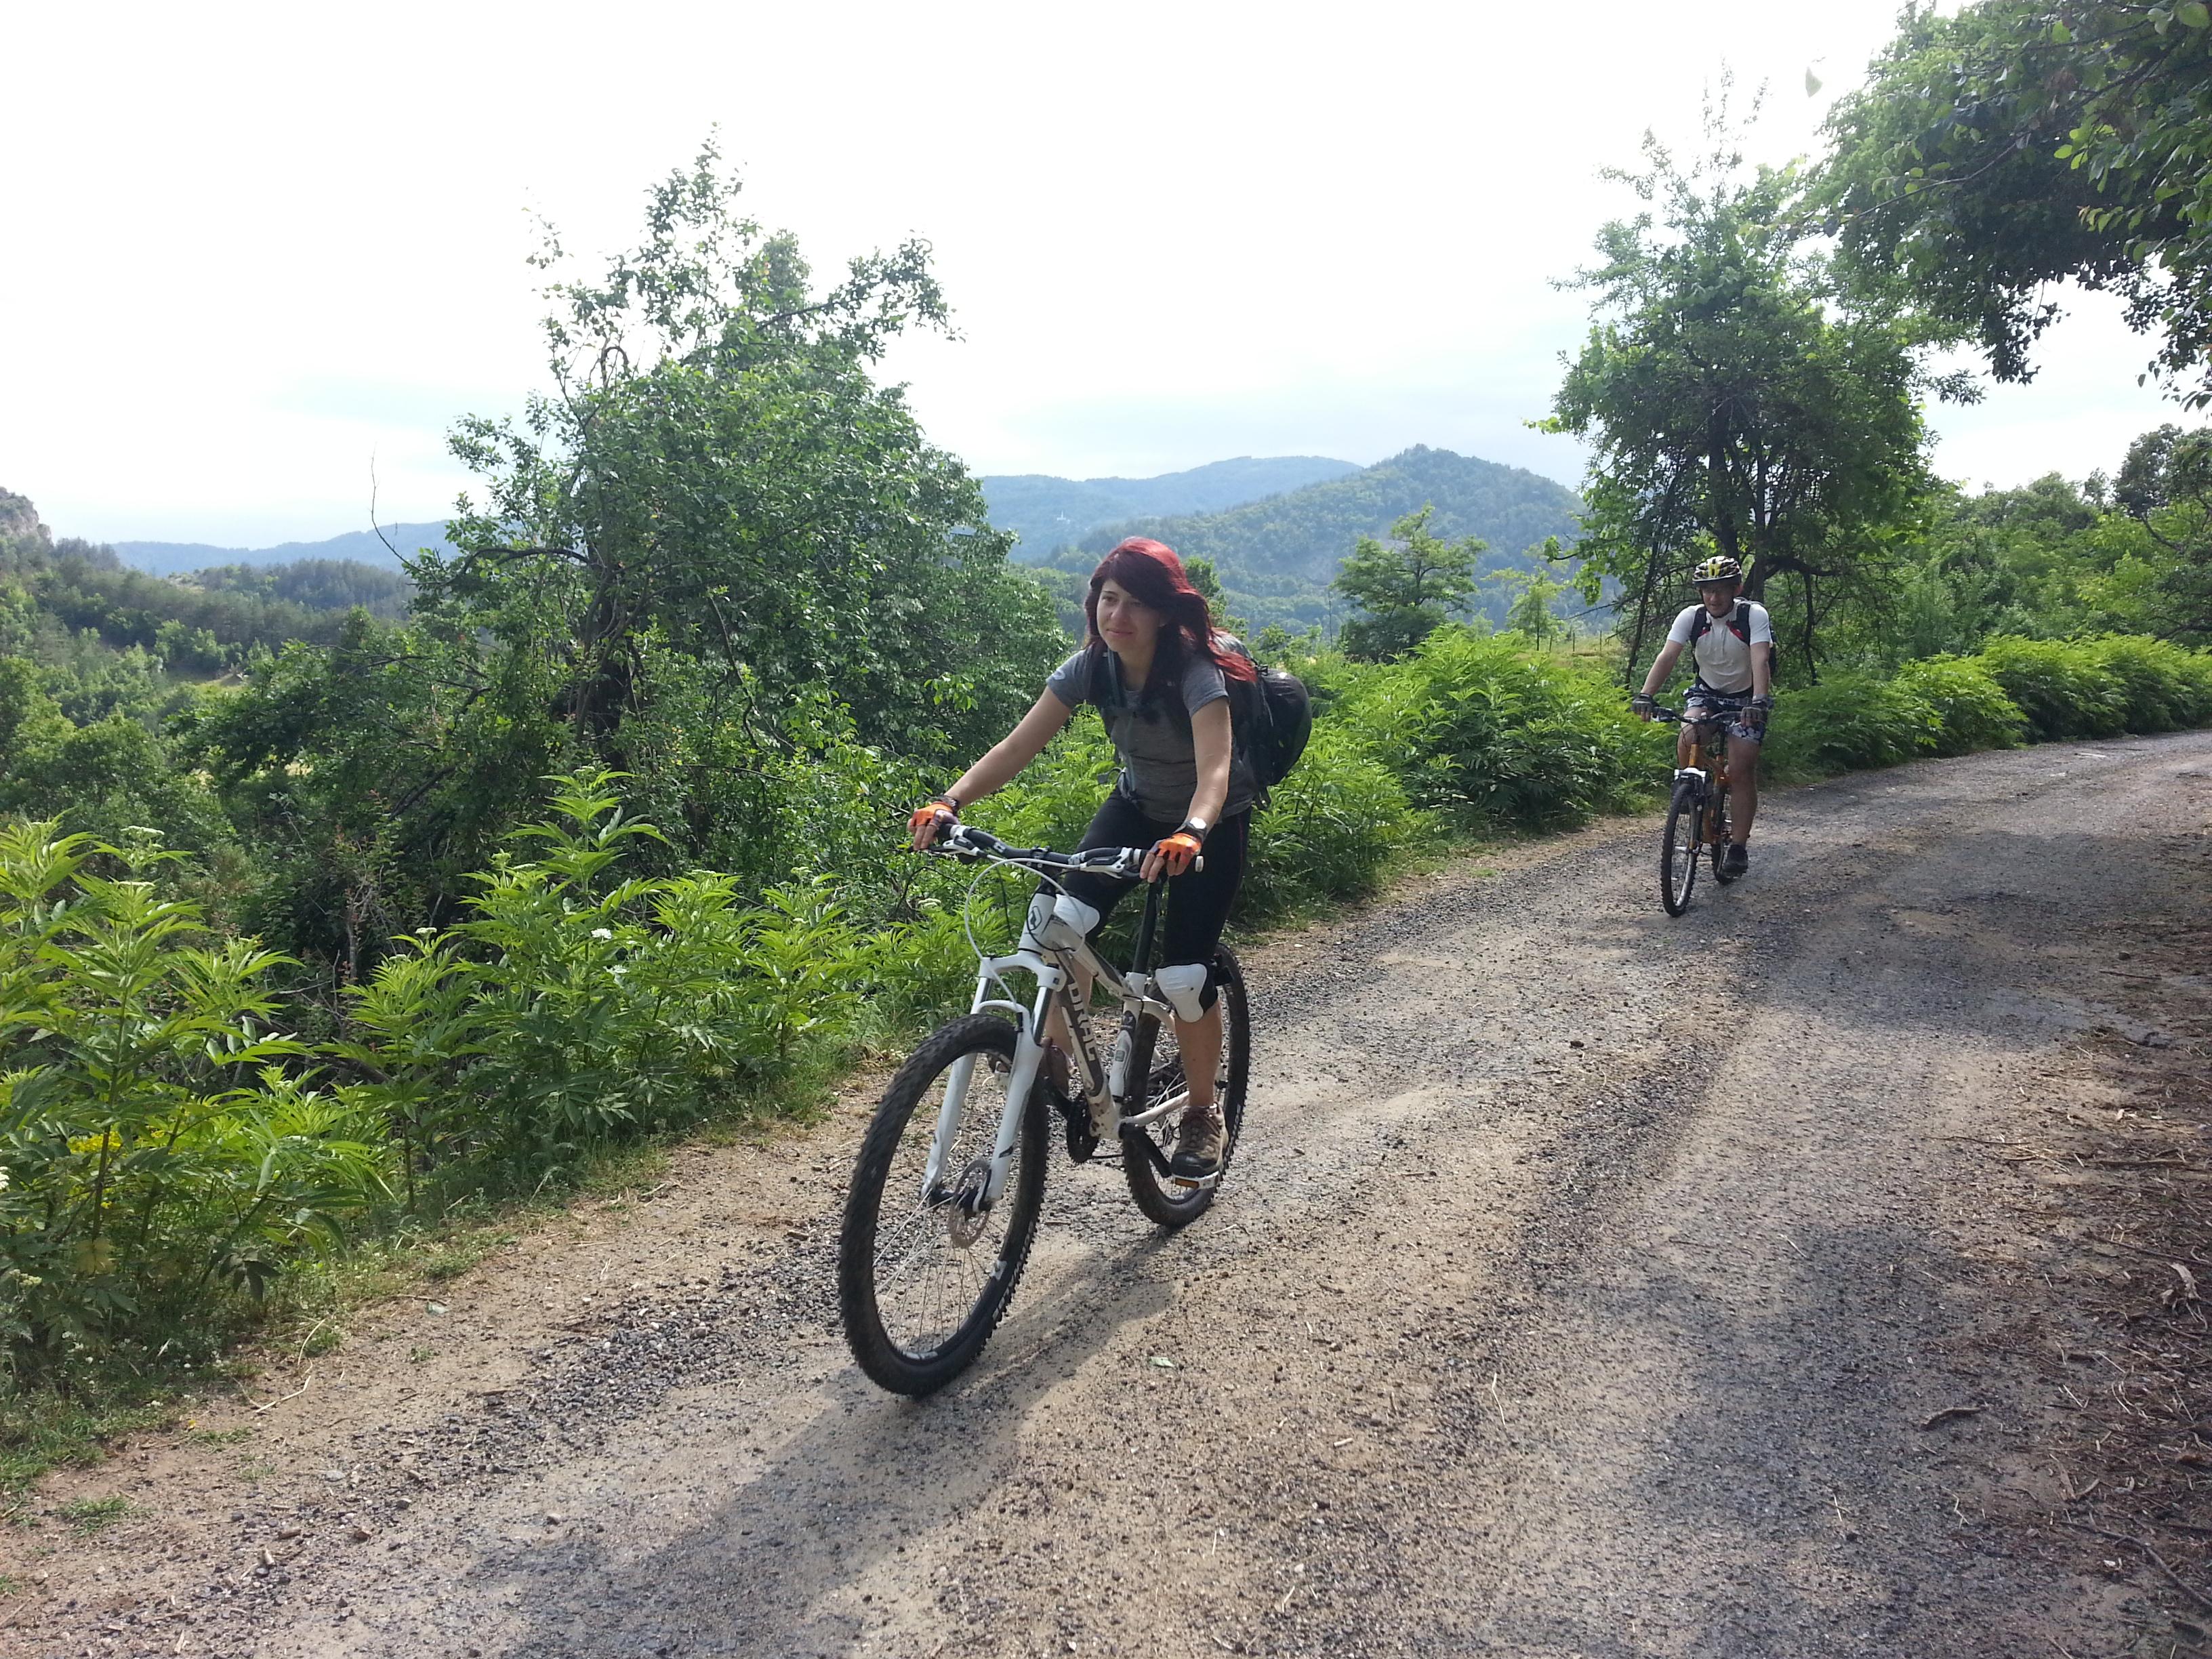 Transrhodopi biking